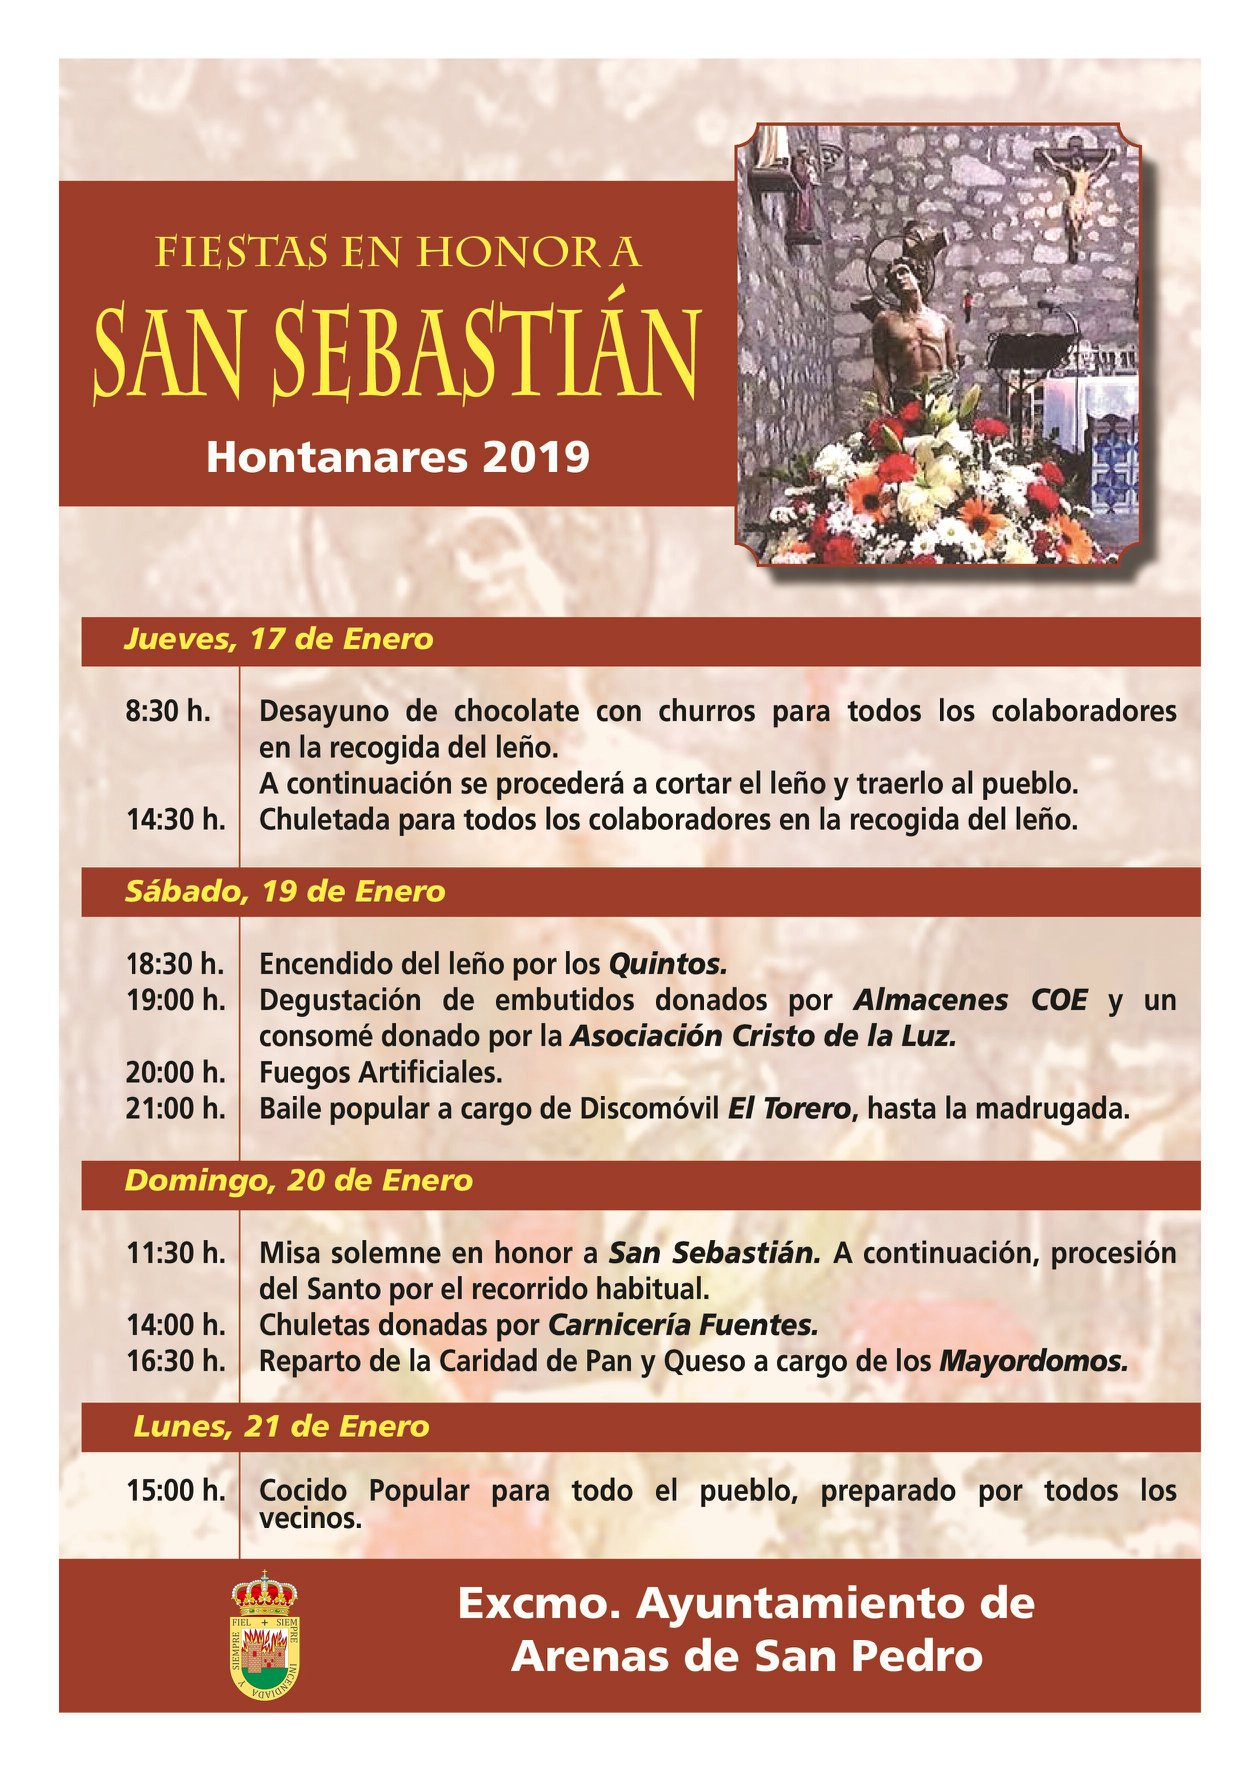 San Sebastián en Hontanares - TiétarTeVe